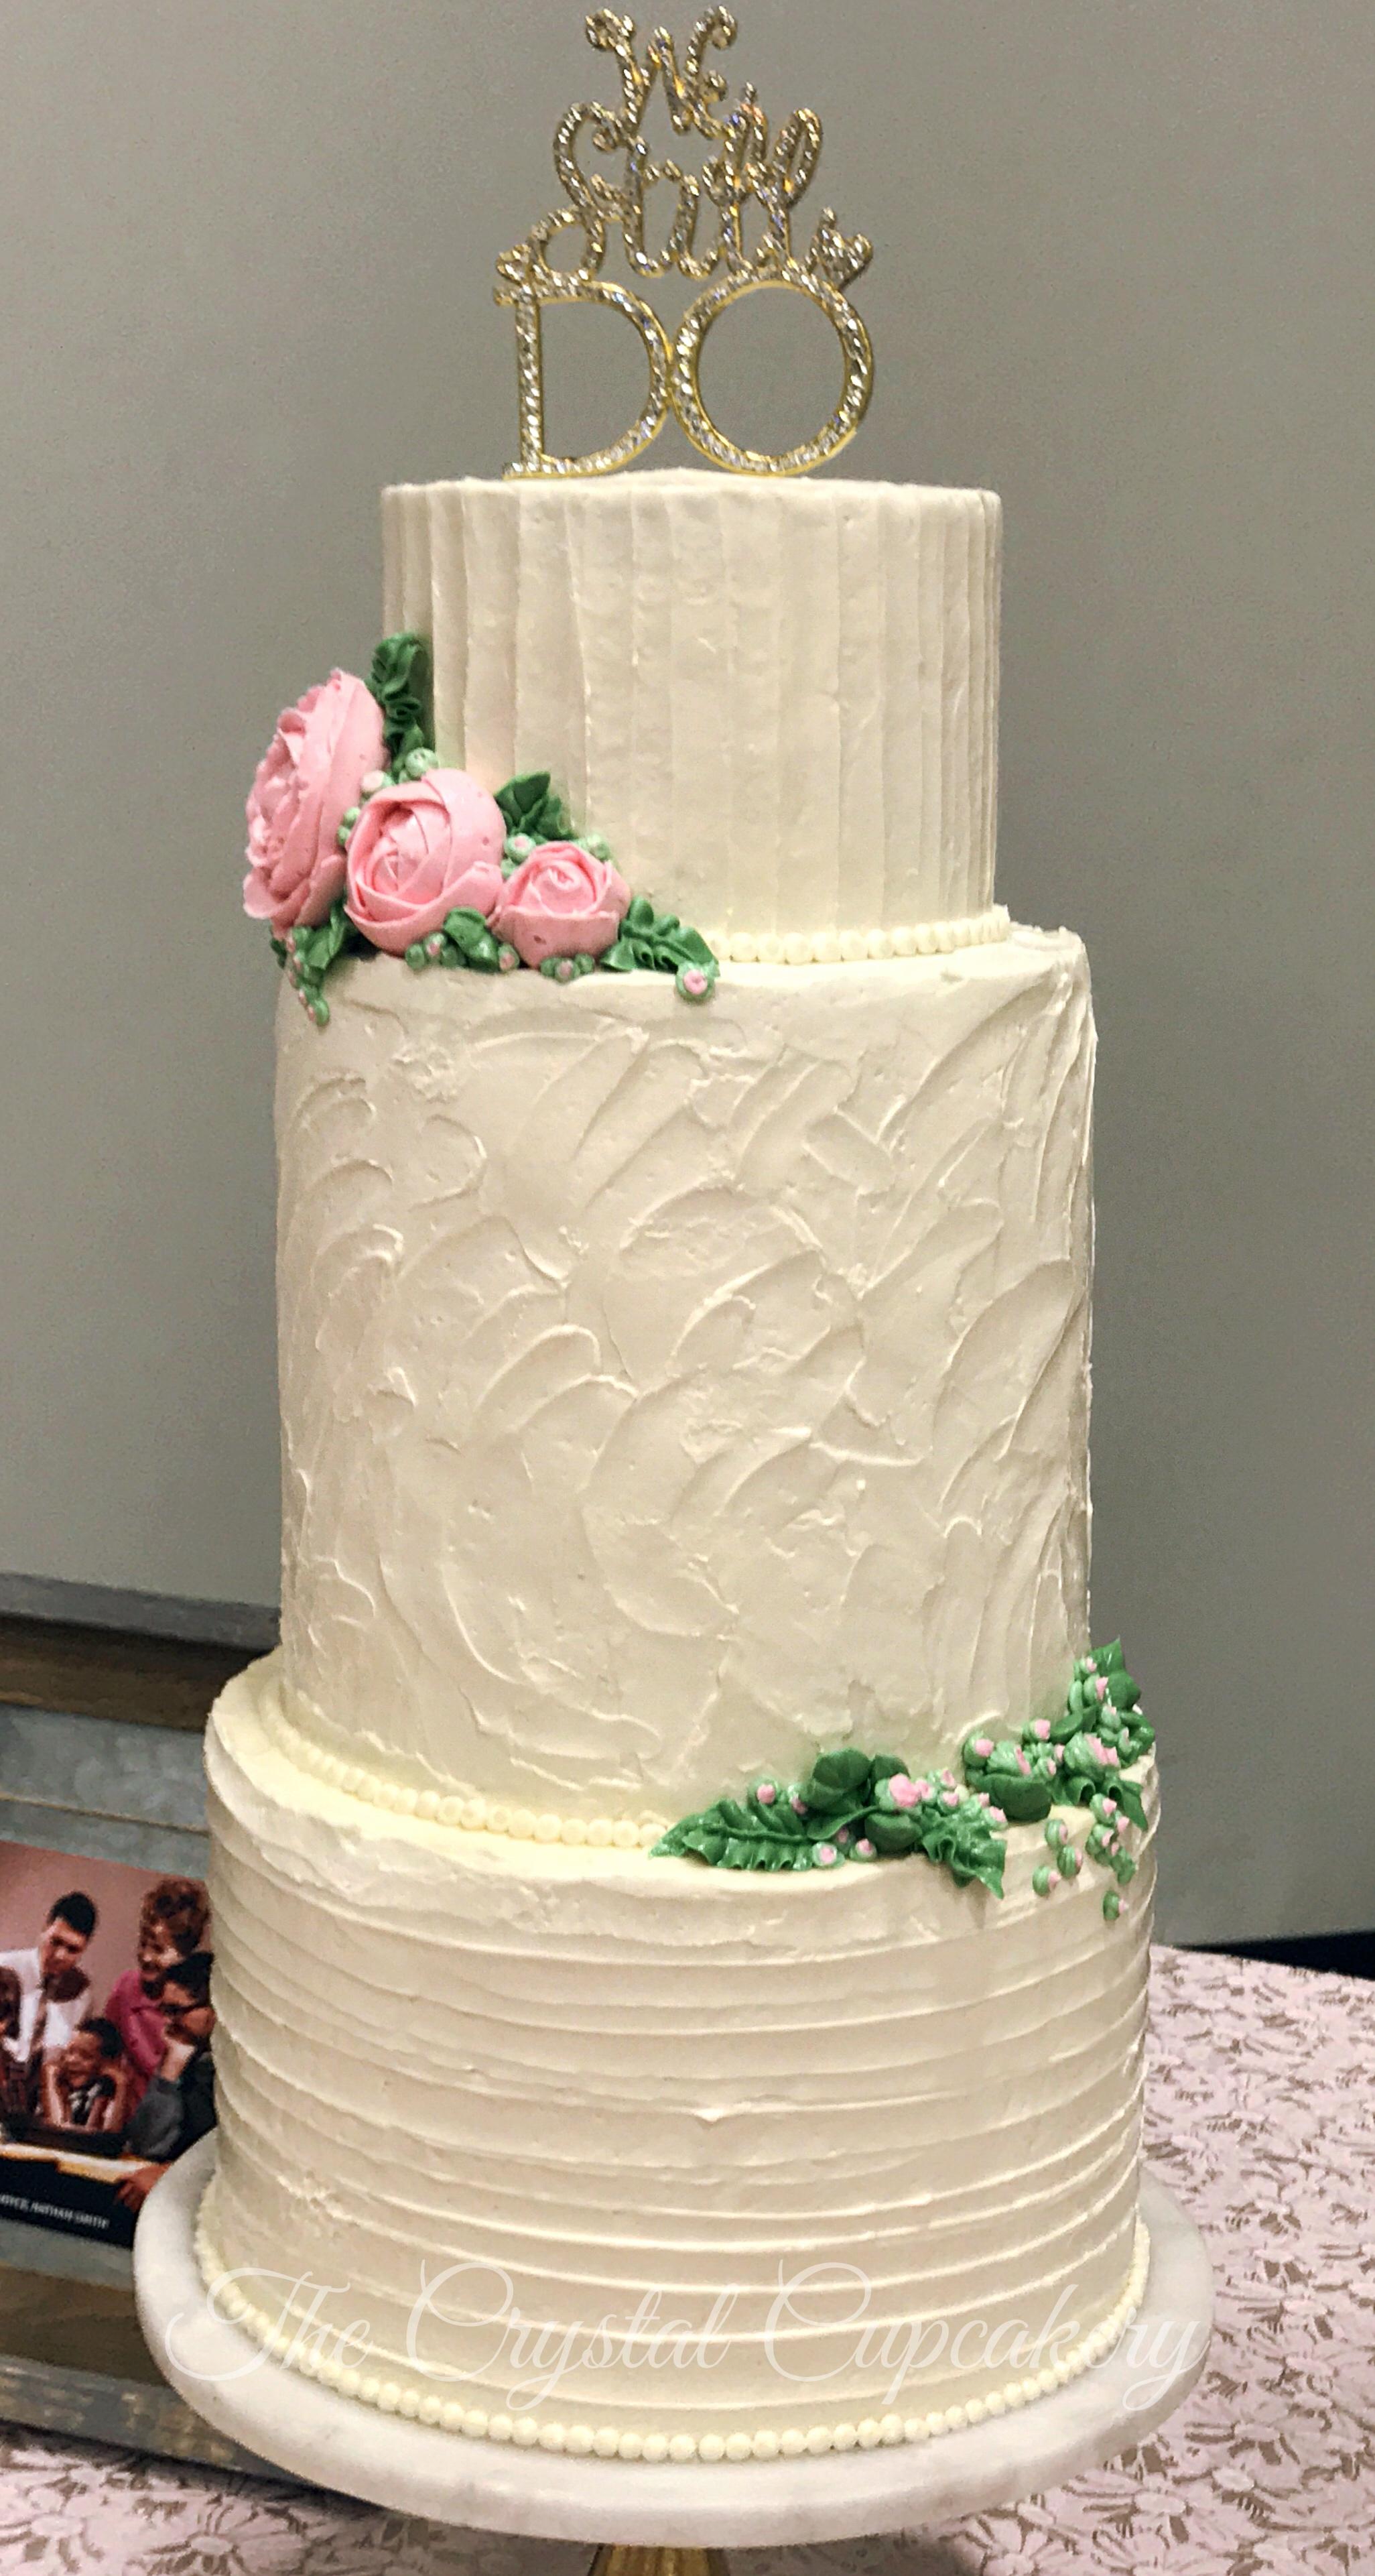 Extra Tall Anniversary Cake